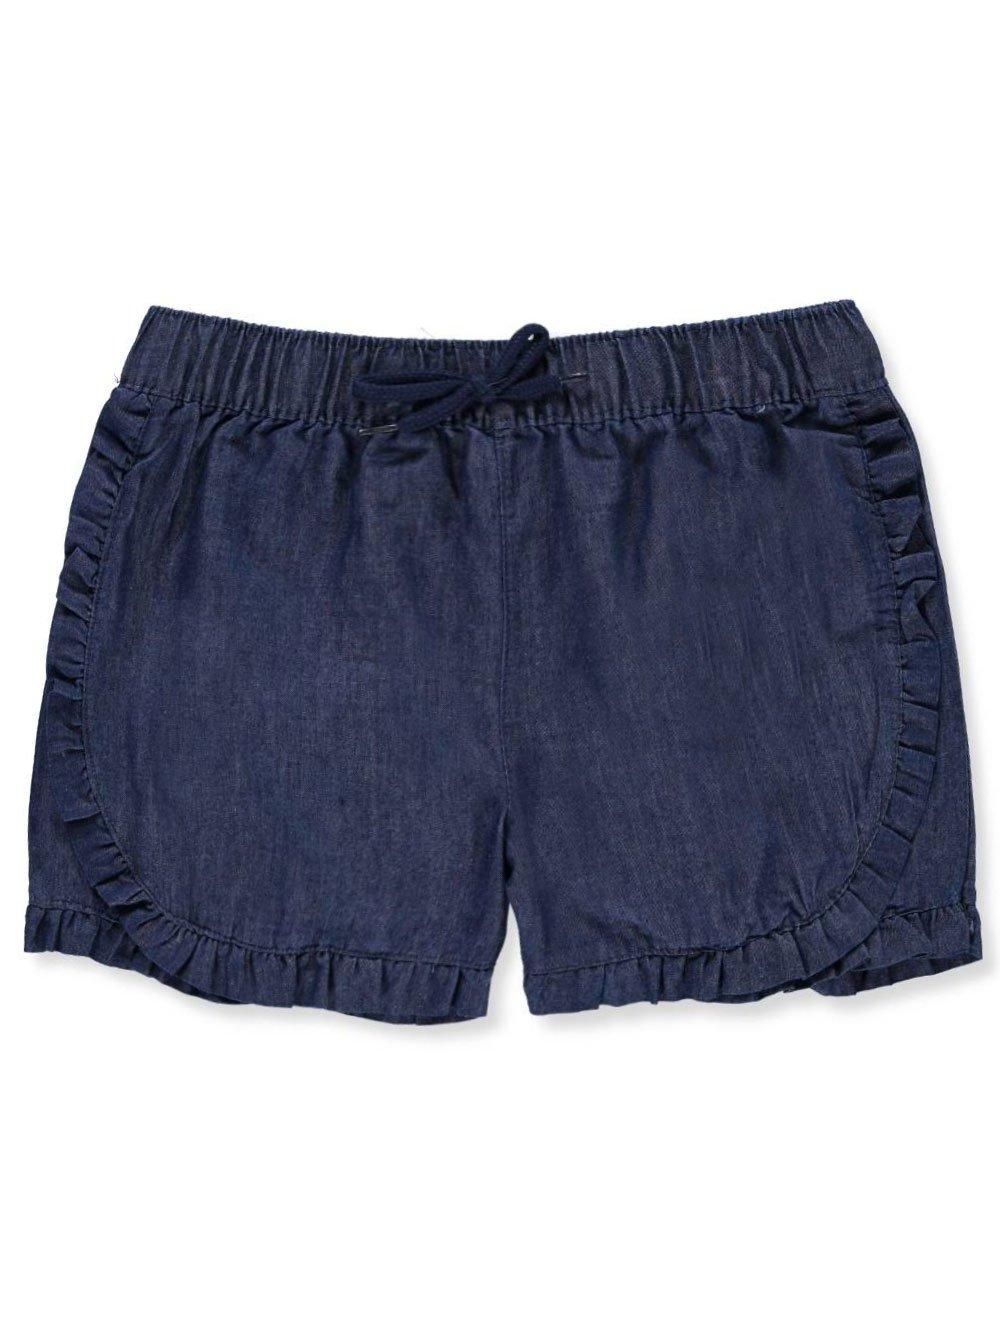 Delia's Girls' Short Shorts 7-8 Delia's